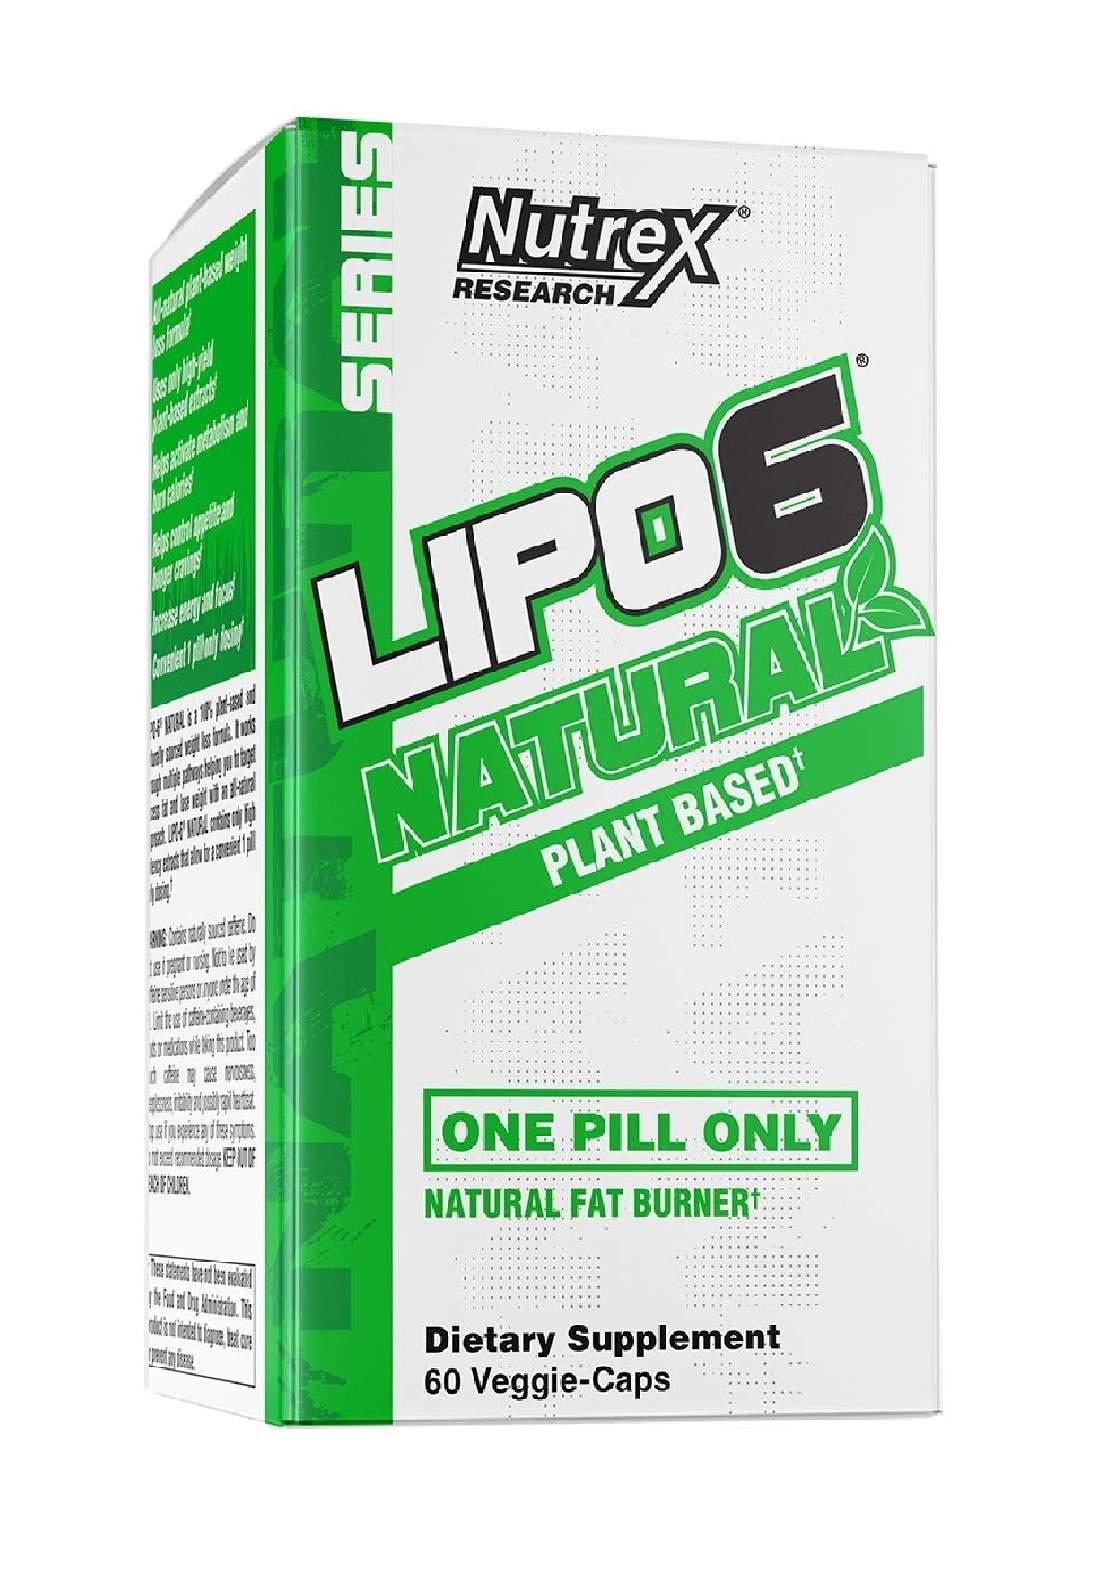 Nutrex Research Natural Series Lipo-6 Natural Fat Burner  Plant Based  60 Veggie-Caps مكمل غذائي نباتي لانقاص الوزن